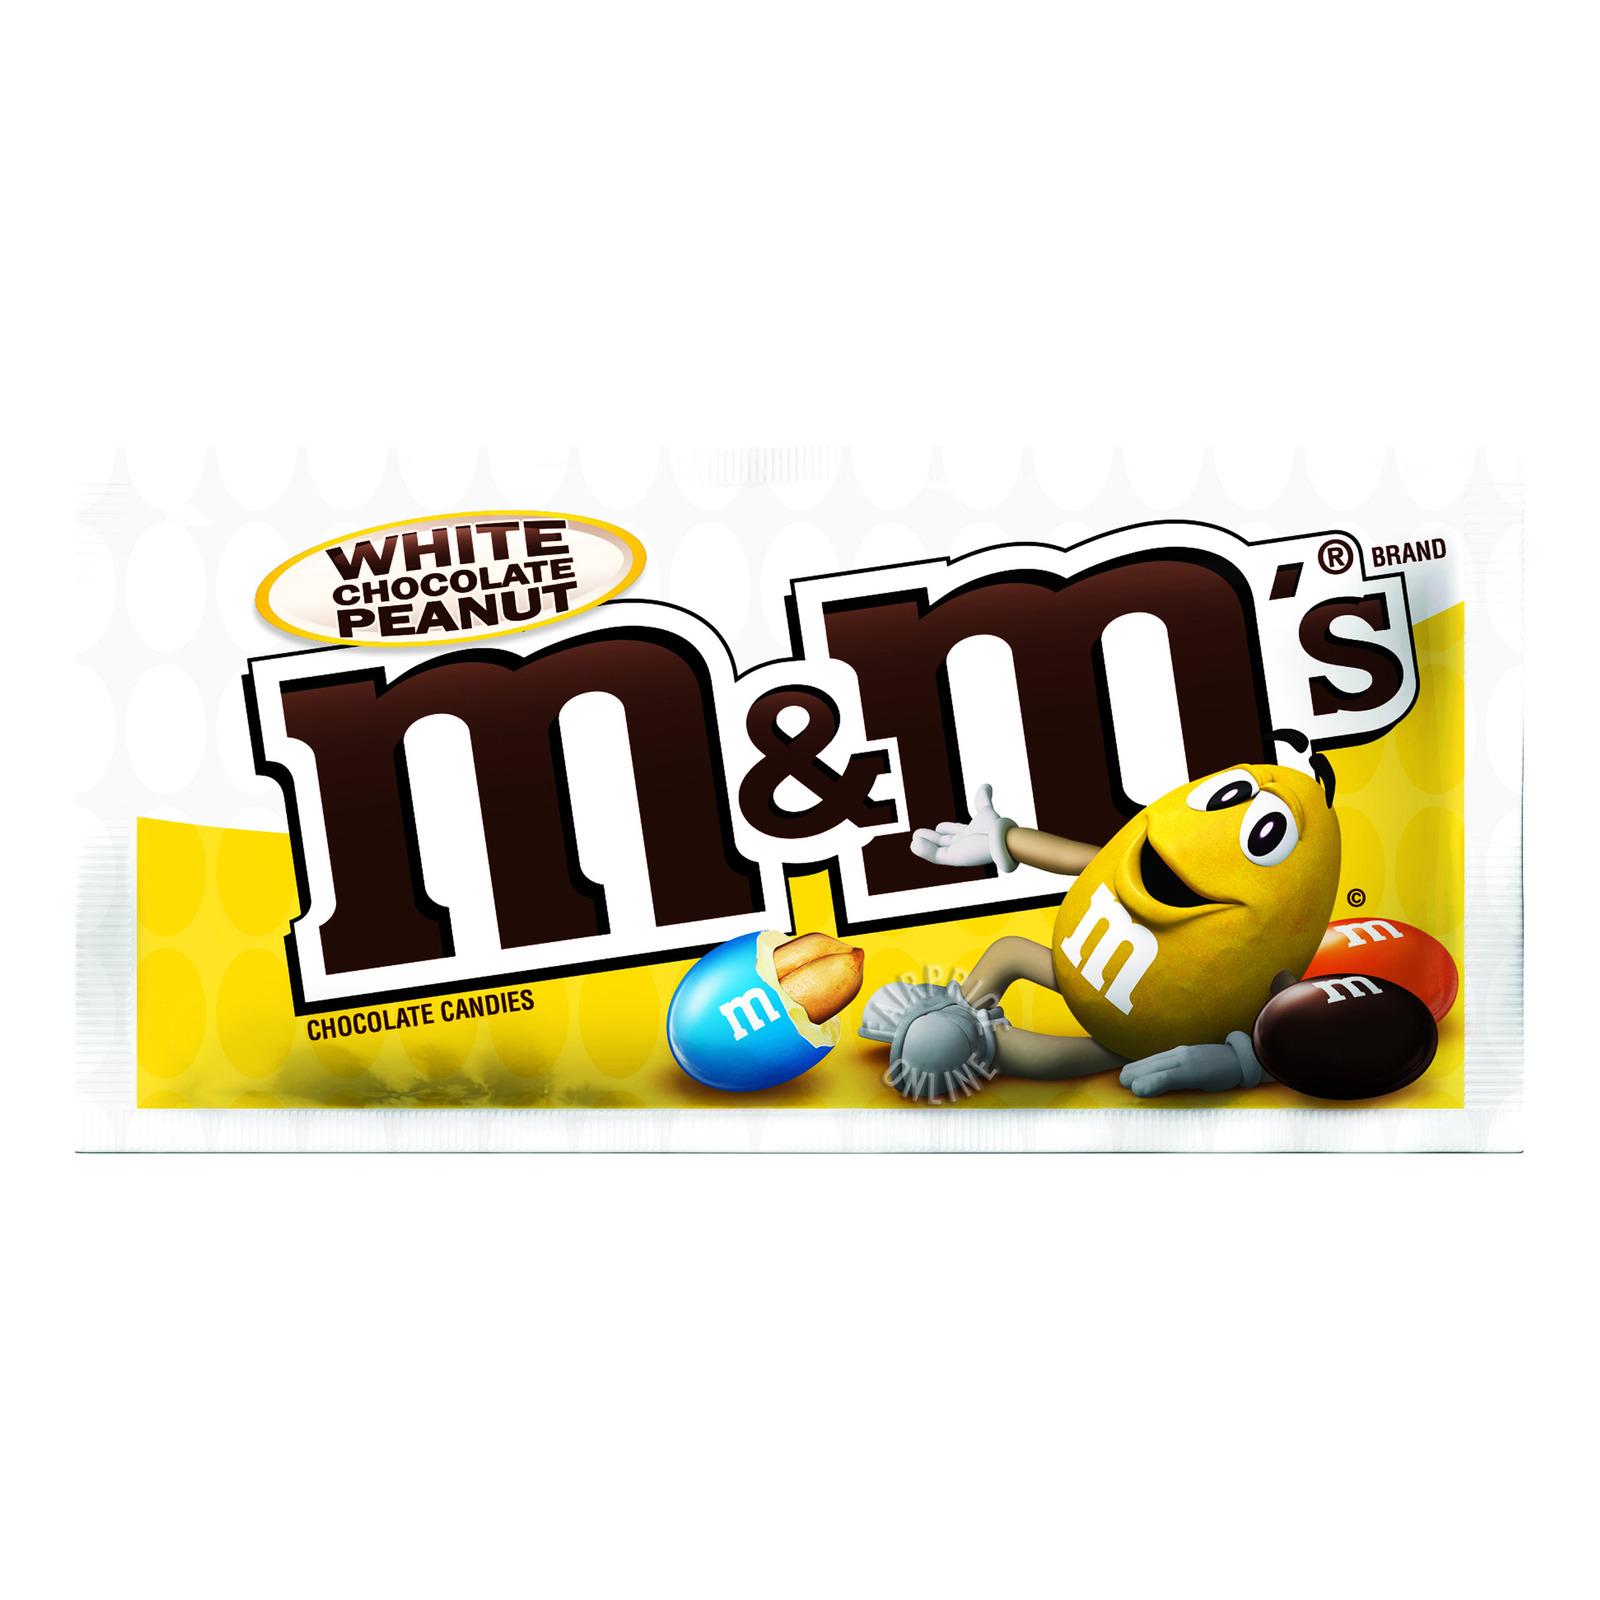 M&M's Chocolate Candies - White Peanut